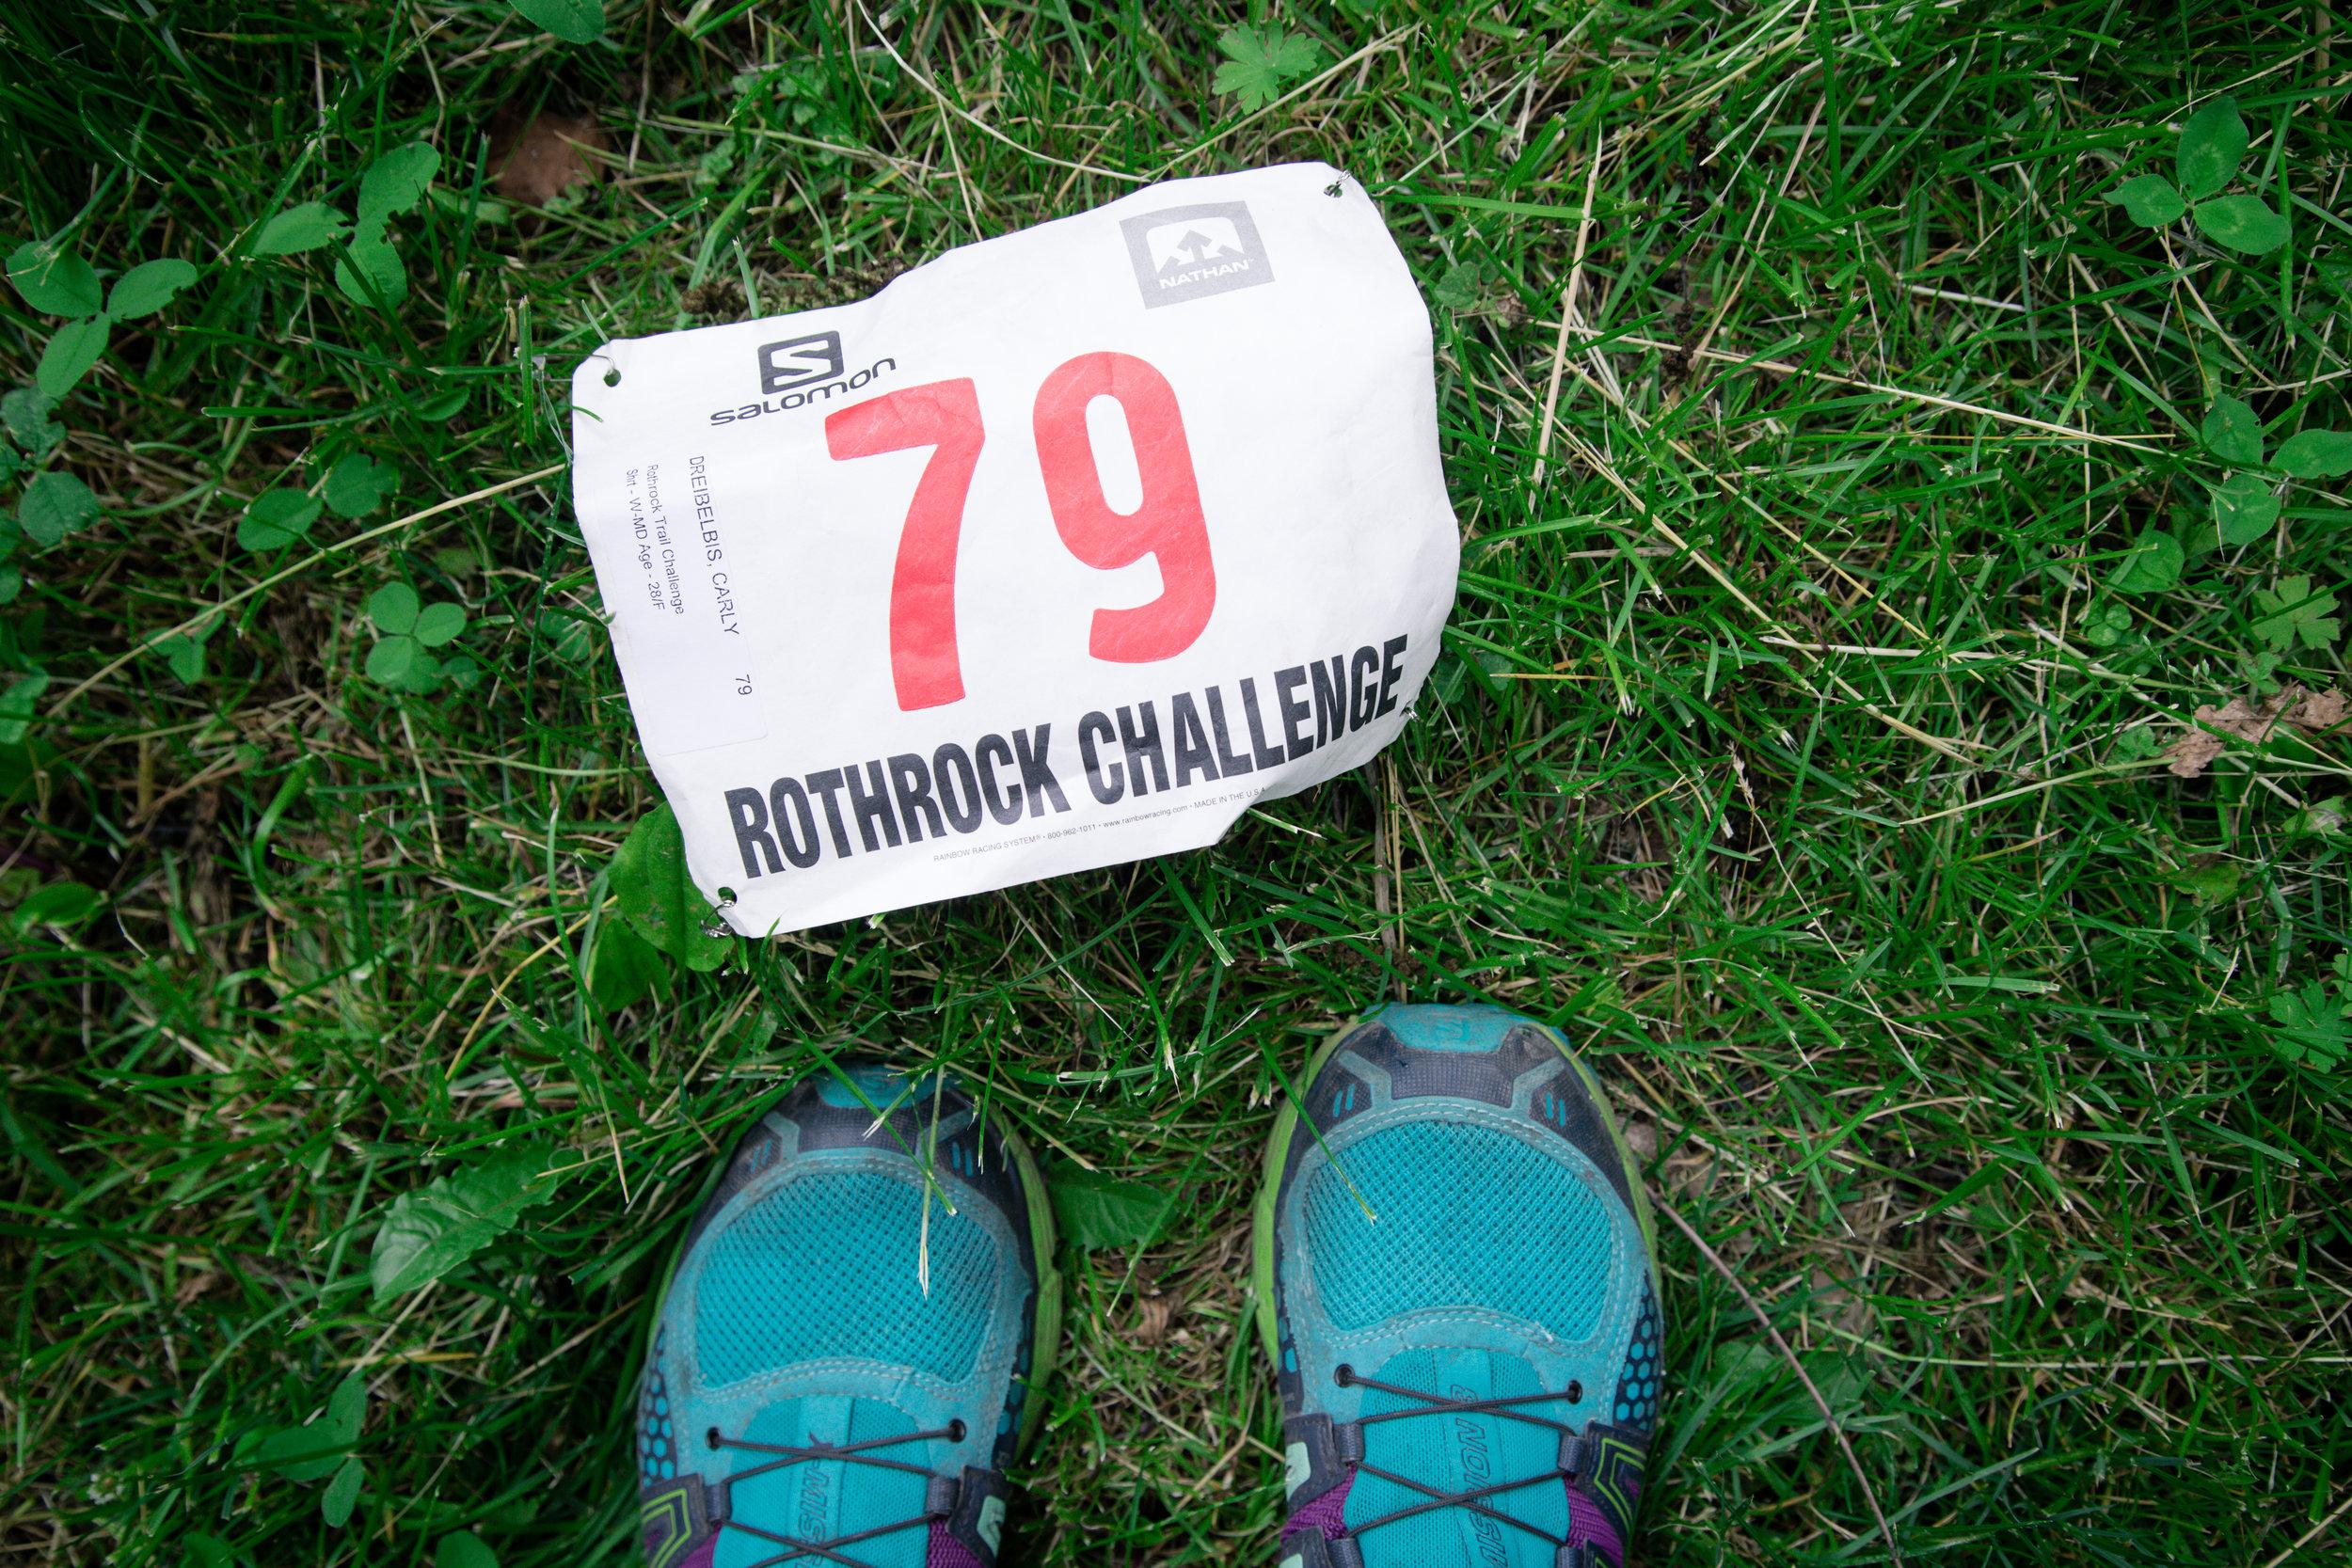 156 // 366 My second Rothrock Challenge